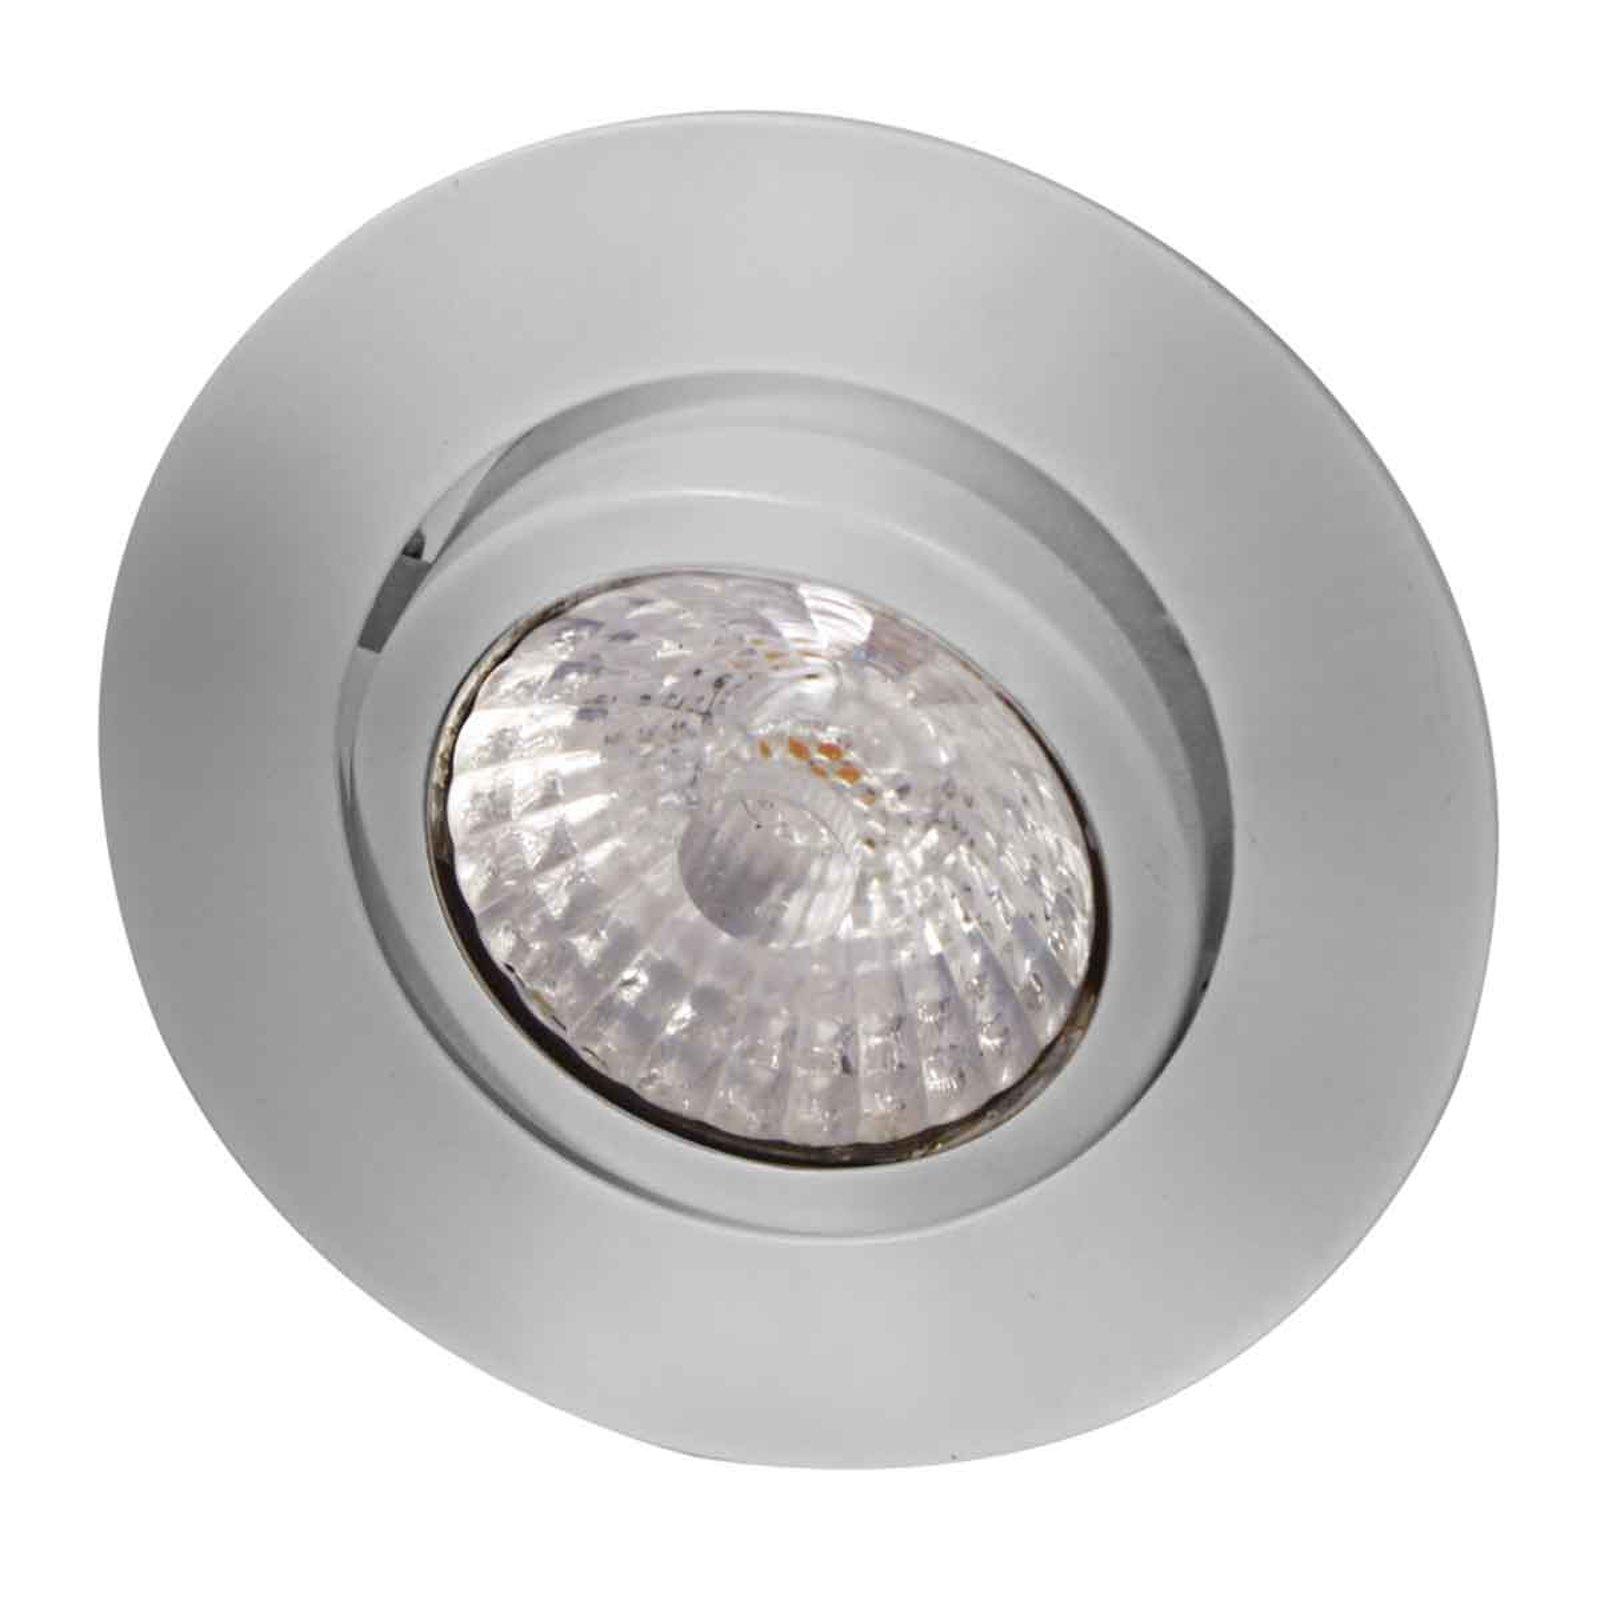 Rico LED innfellingstakspot 9 W, børstet stål